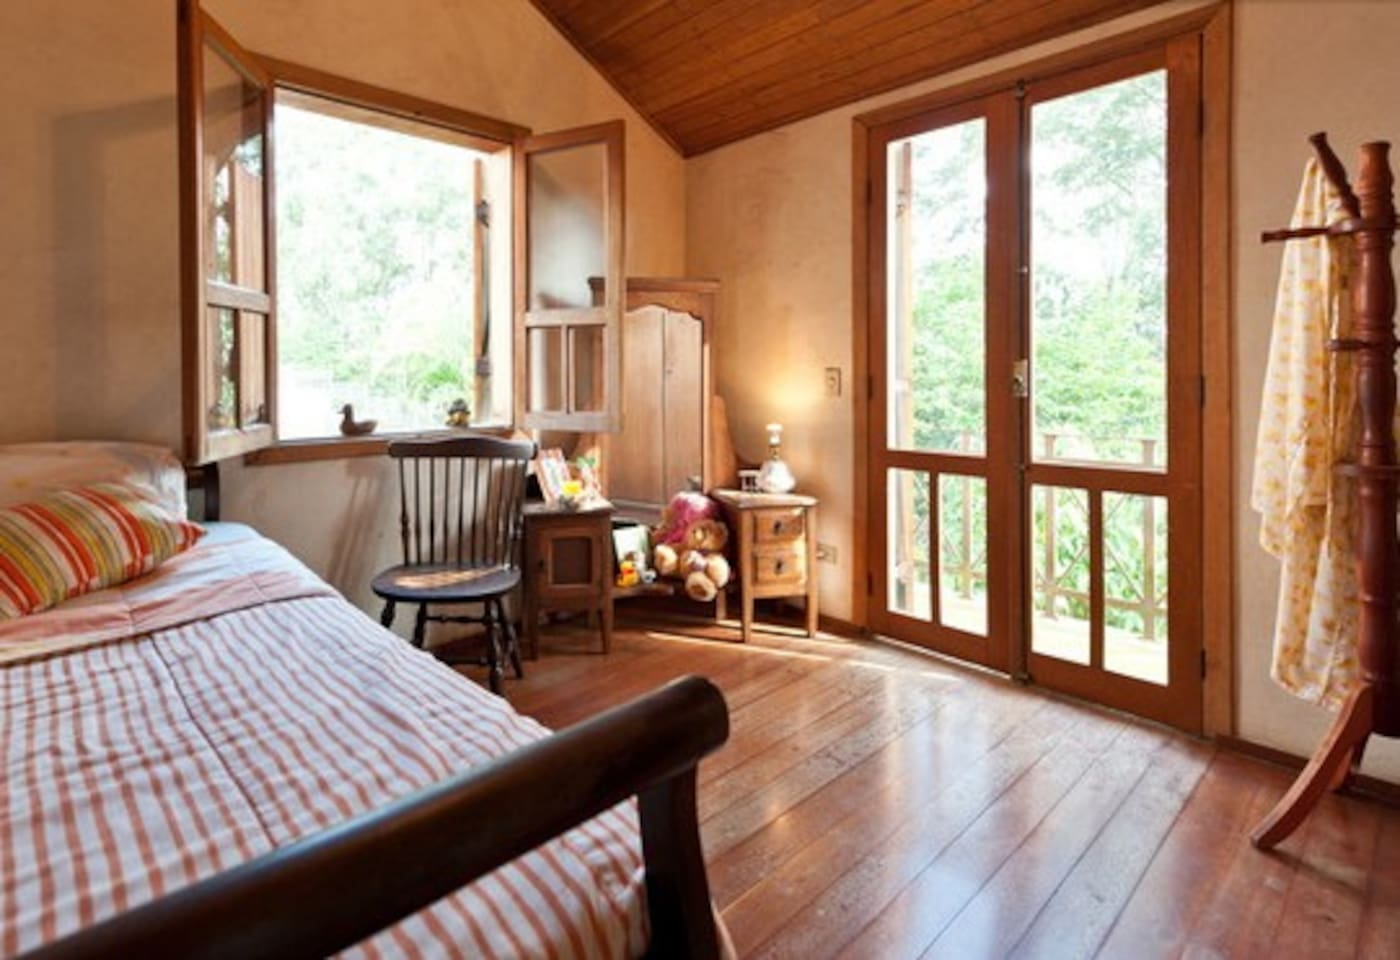 Room overlooking a beautiful lake